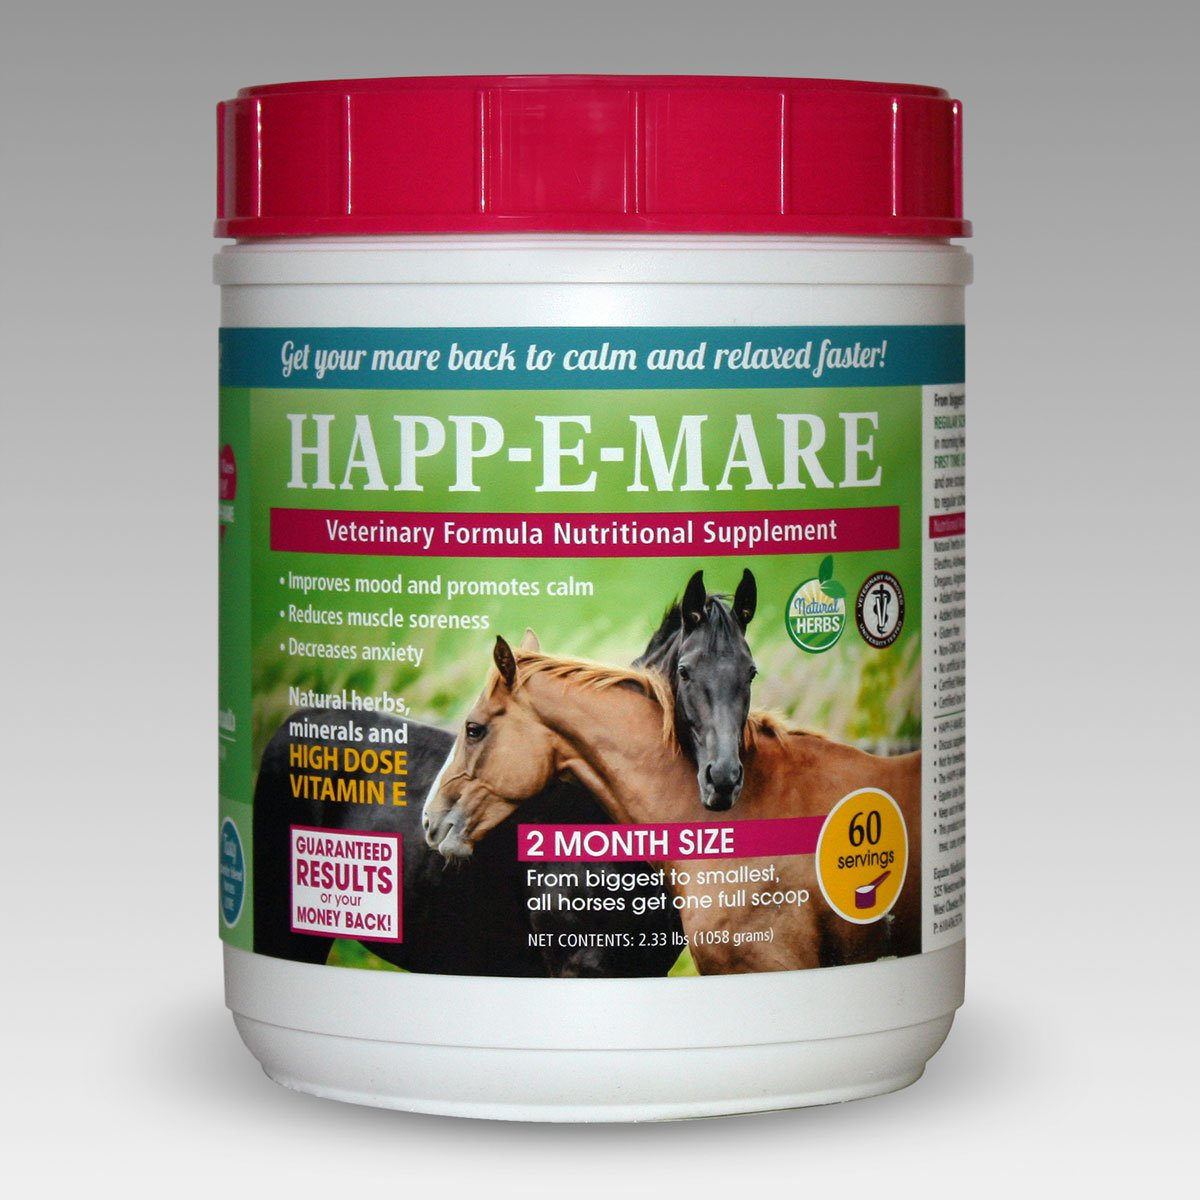 RJ matthews Happ-E-Mare Equine Supplement by RJ matthews